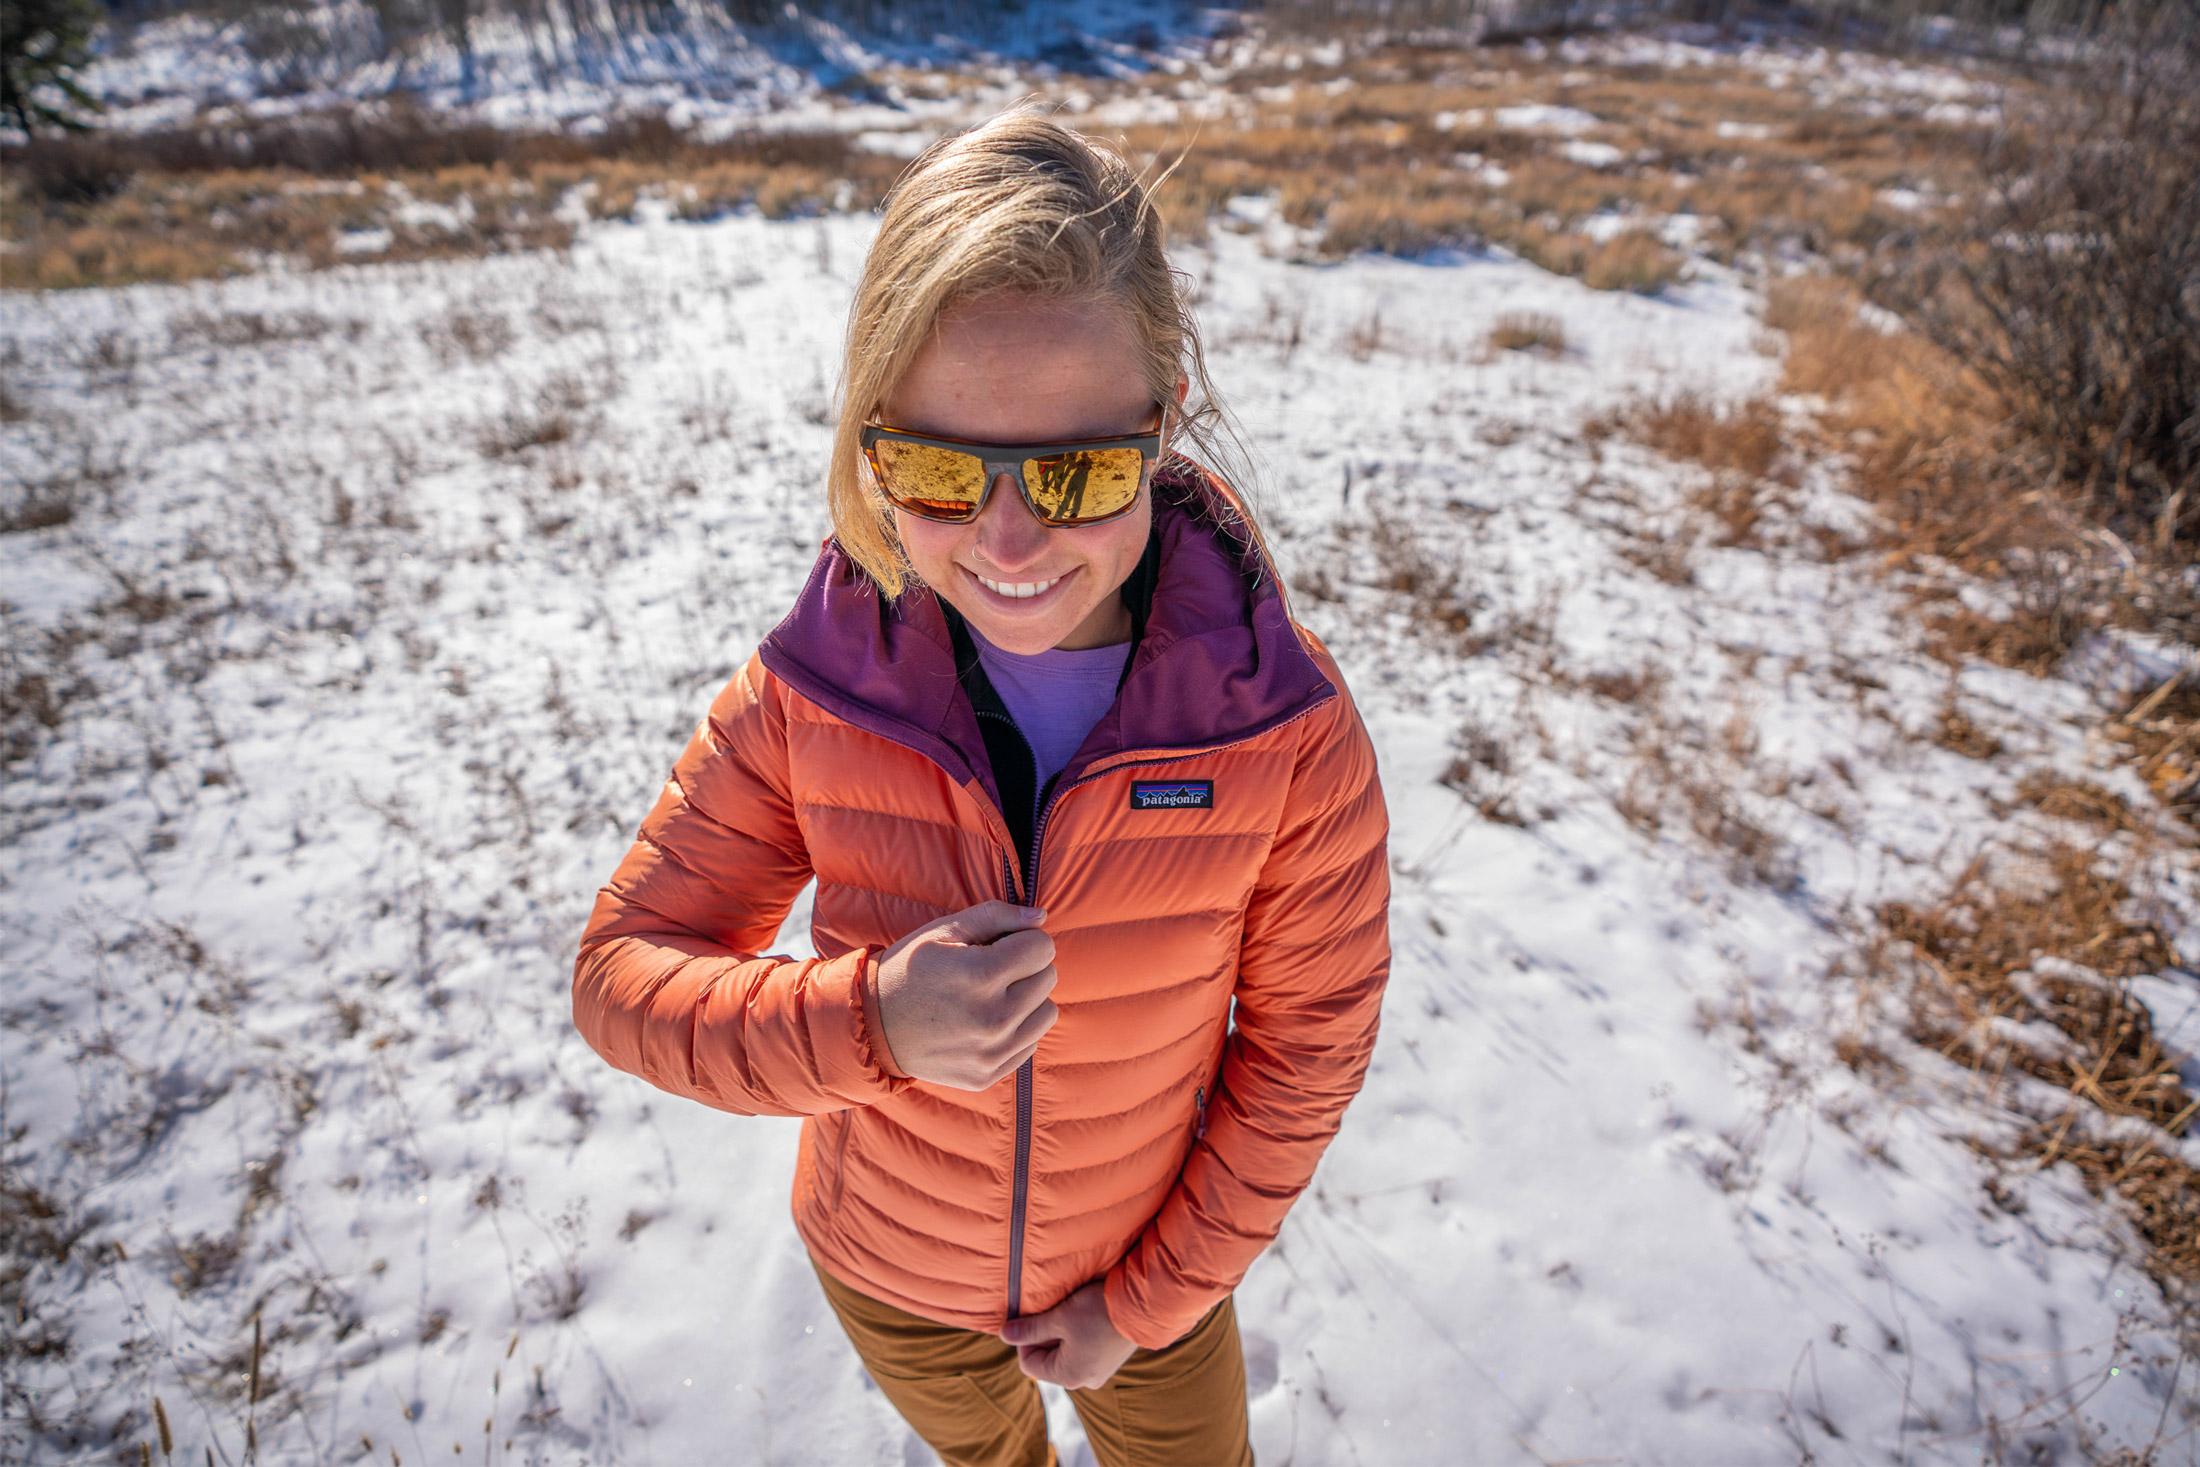 woman zipping up patagonia winter jacket